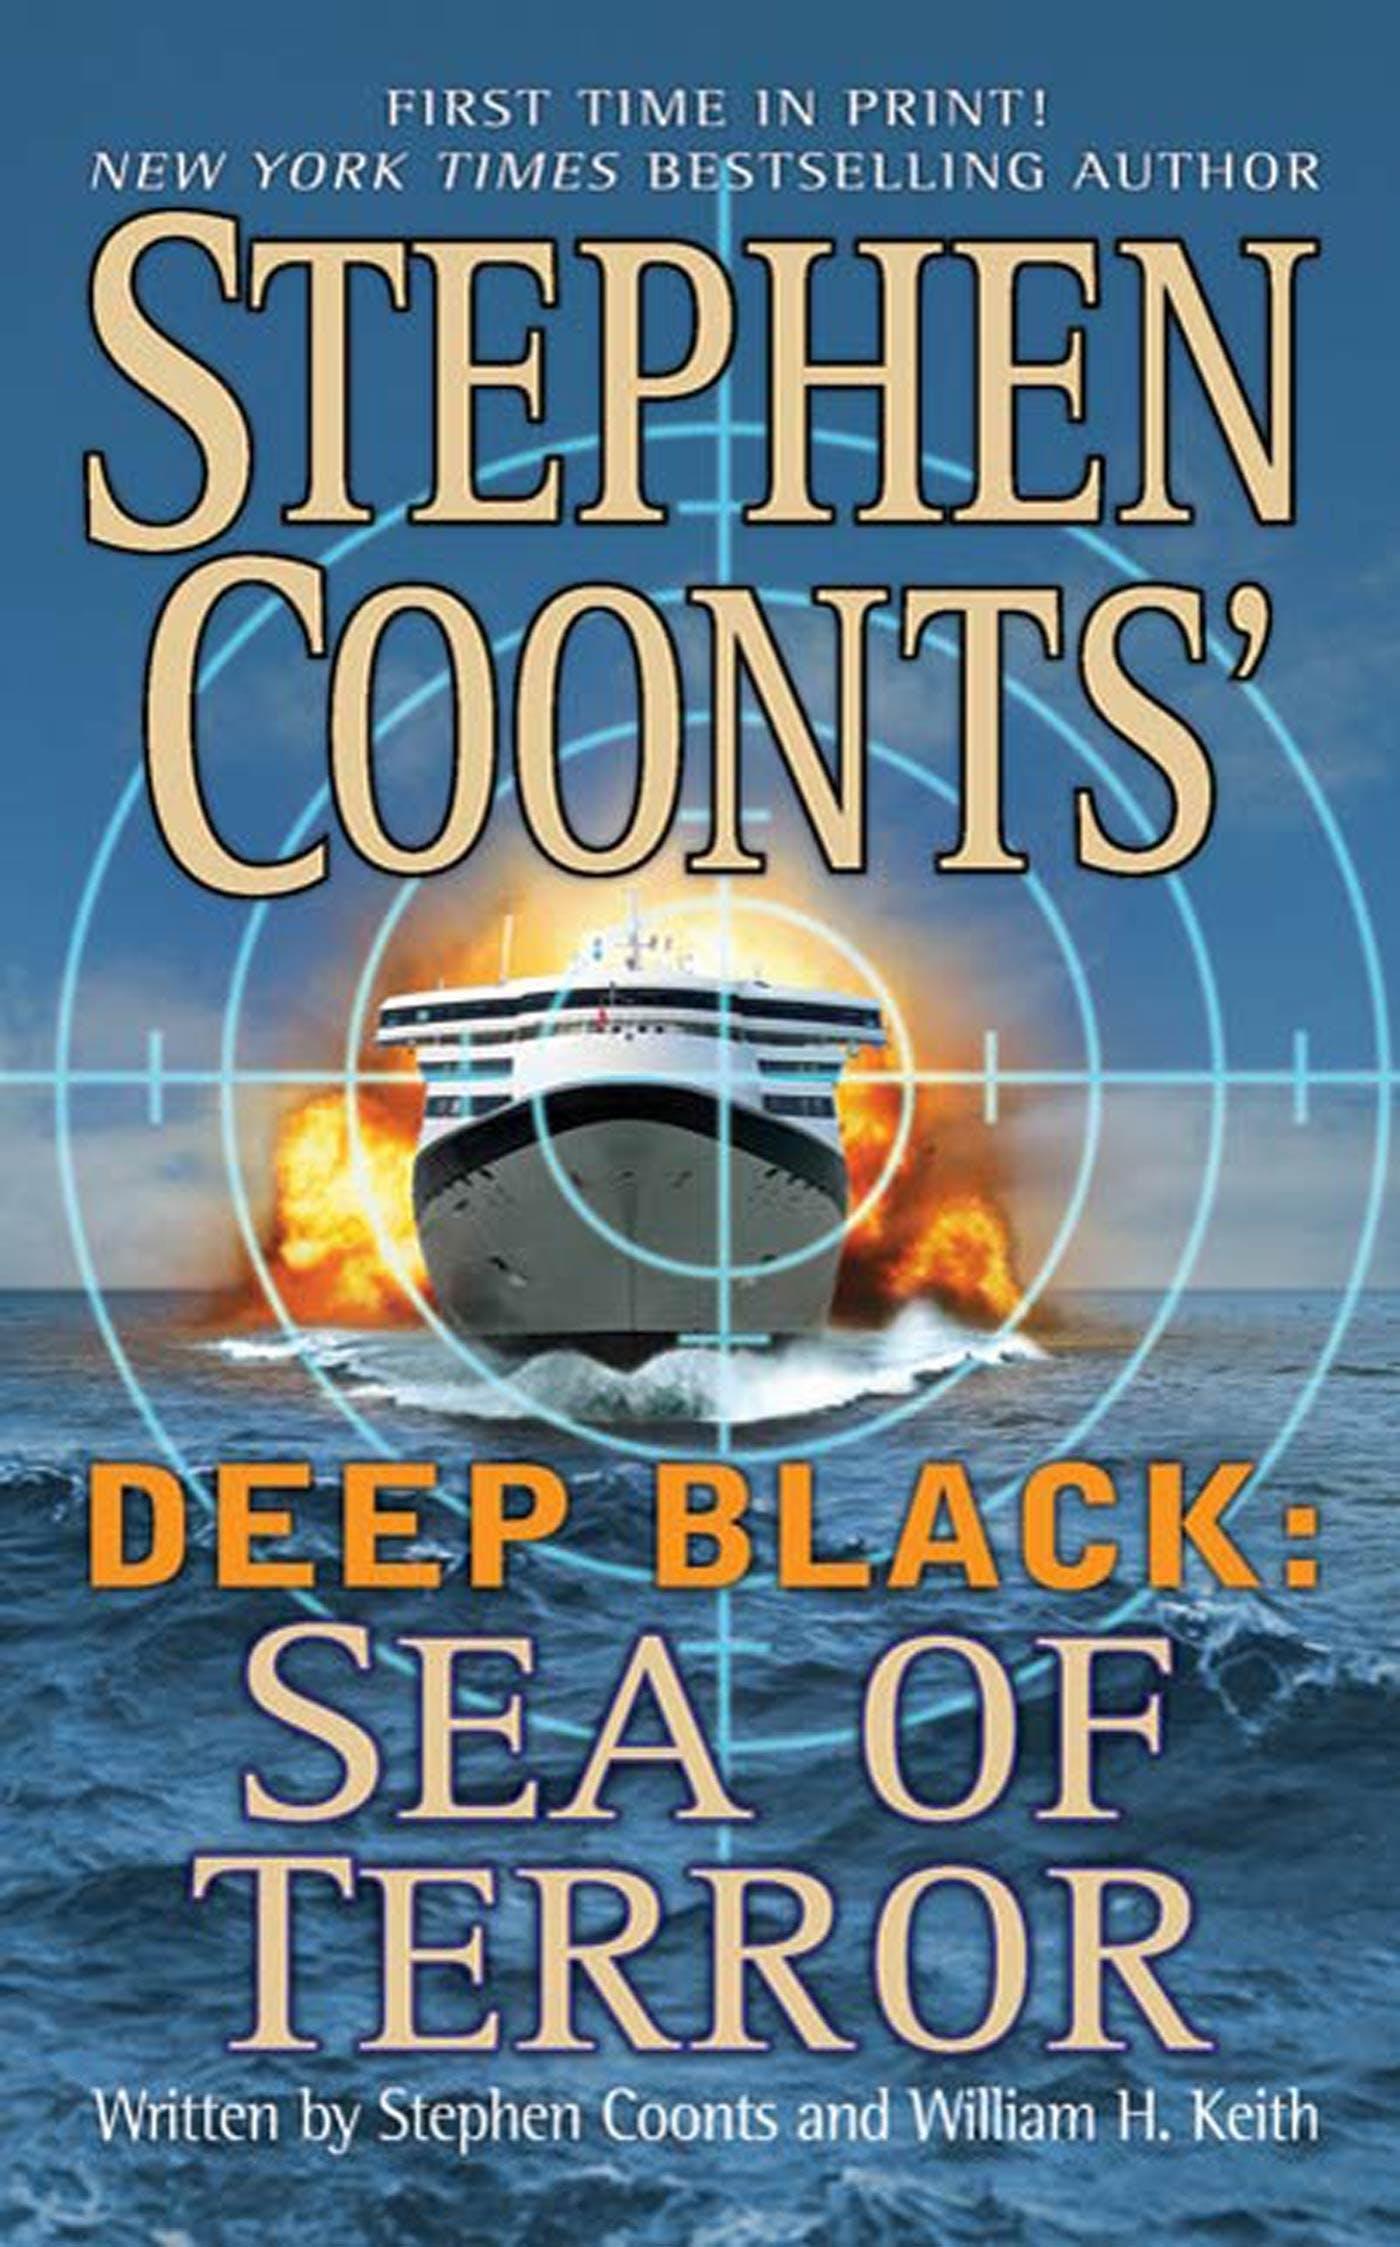 Image of Stephen Coonts' Deep Black: Sea of Terror